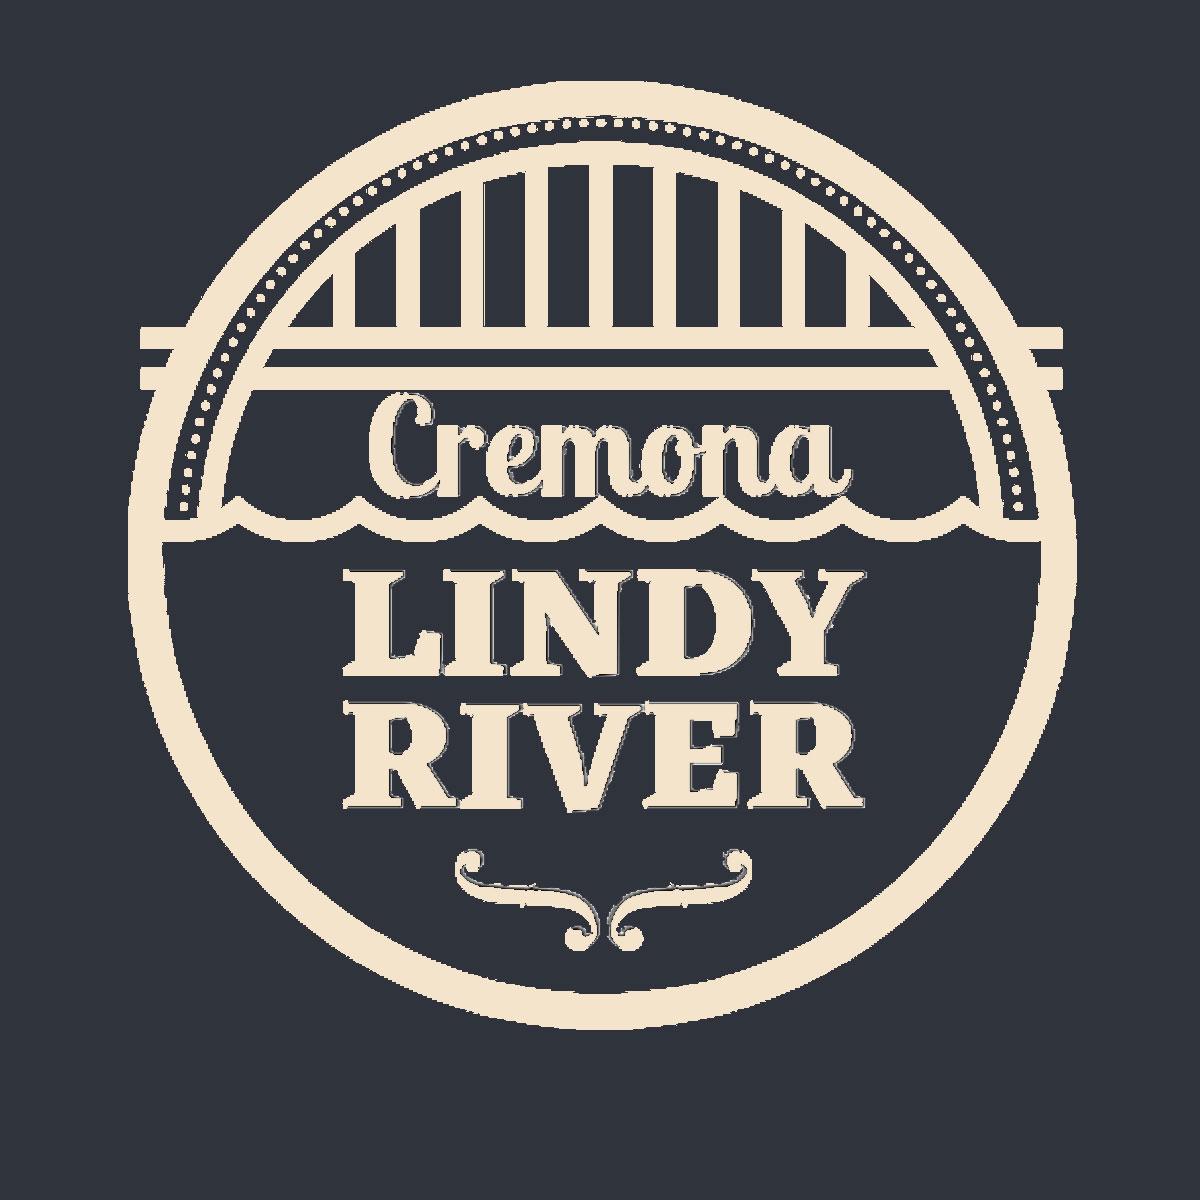 Cremona Lindy River